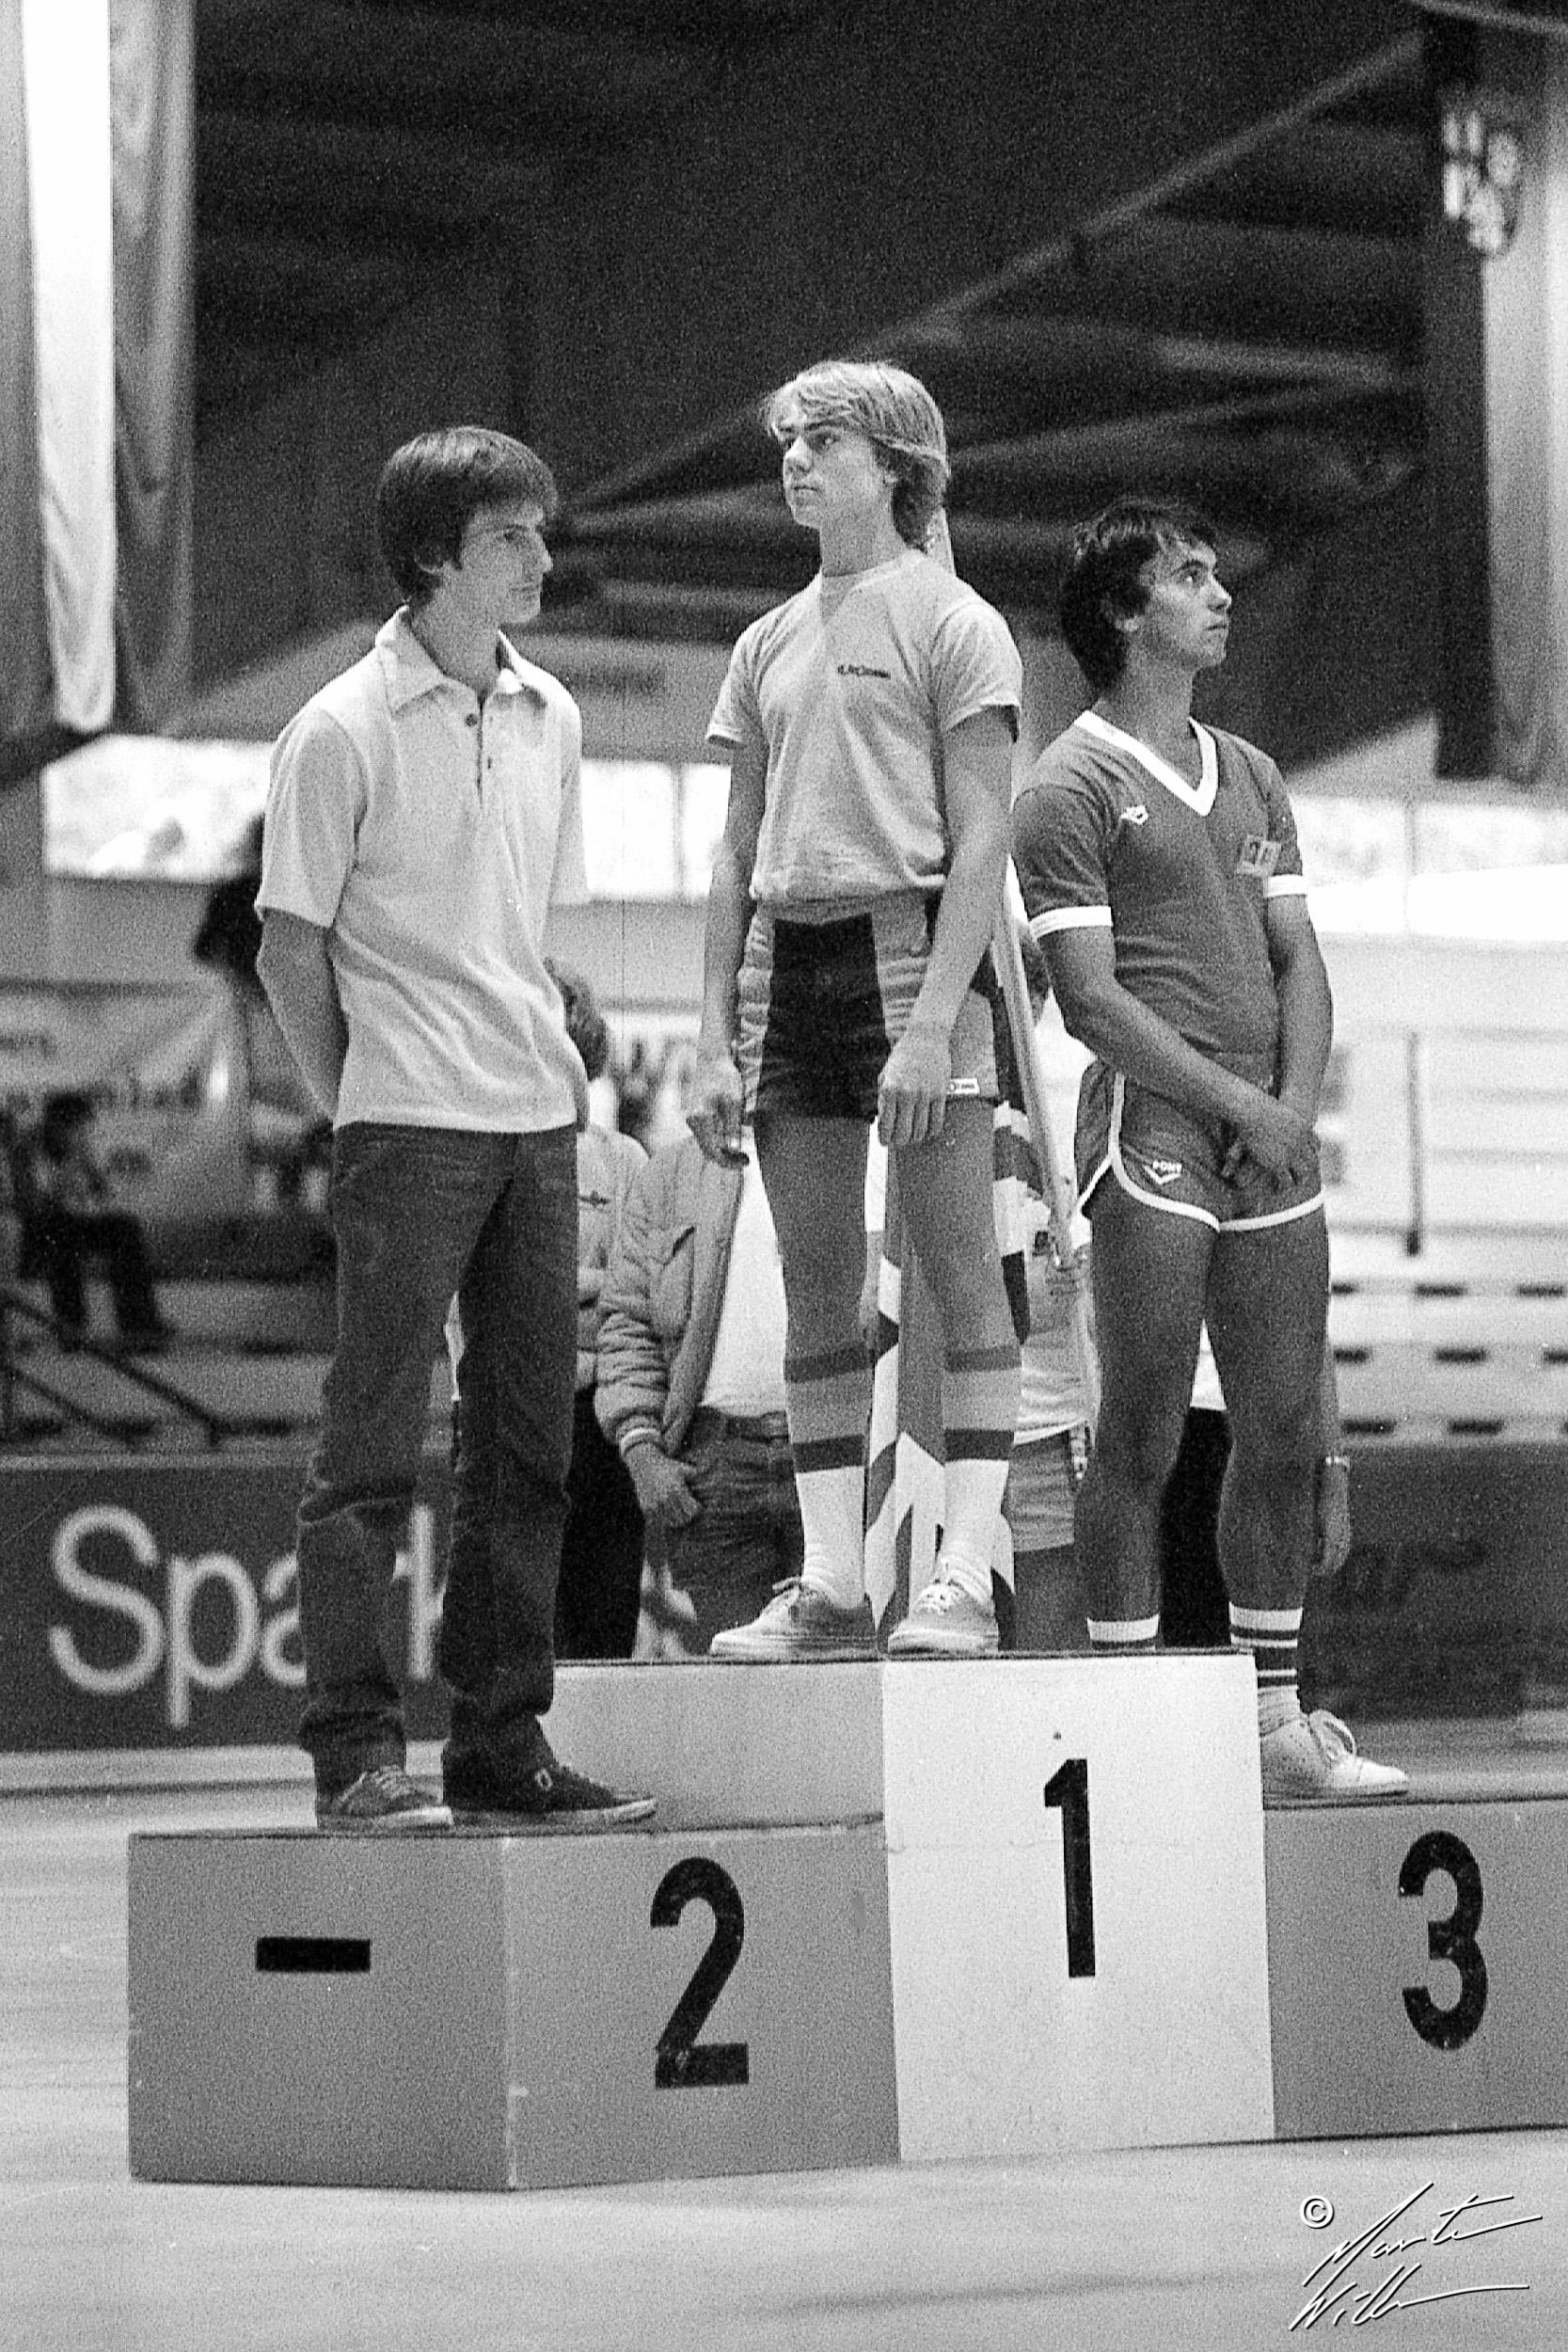 Per Welinder, Europamästare, Altenau, 1981